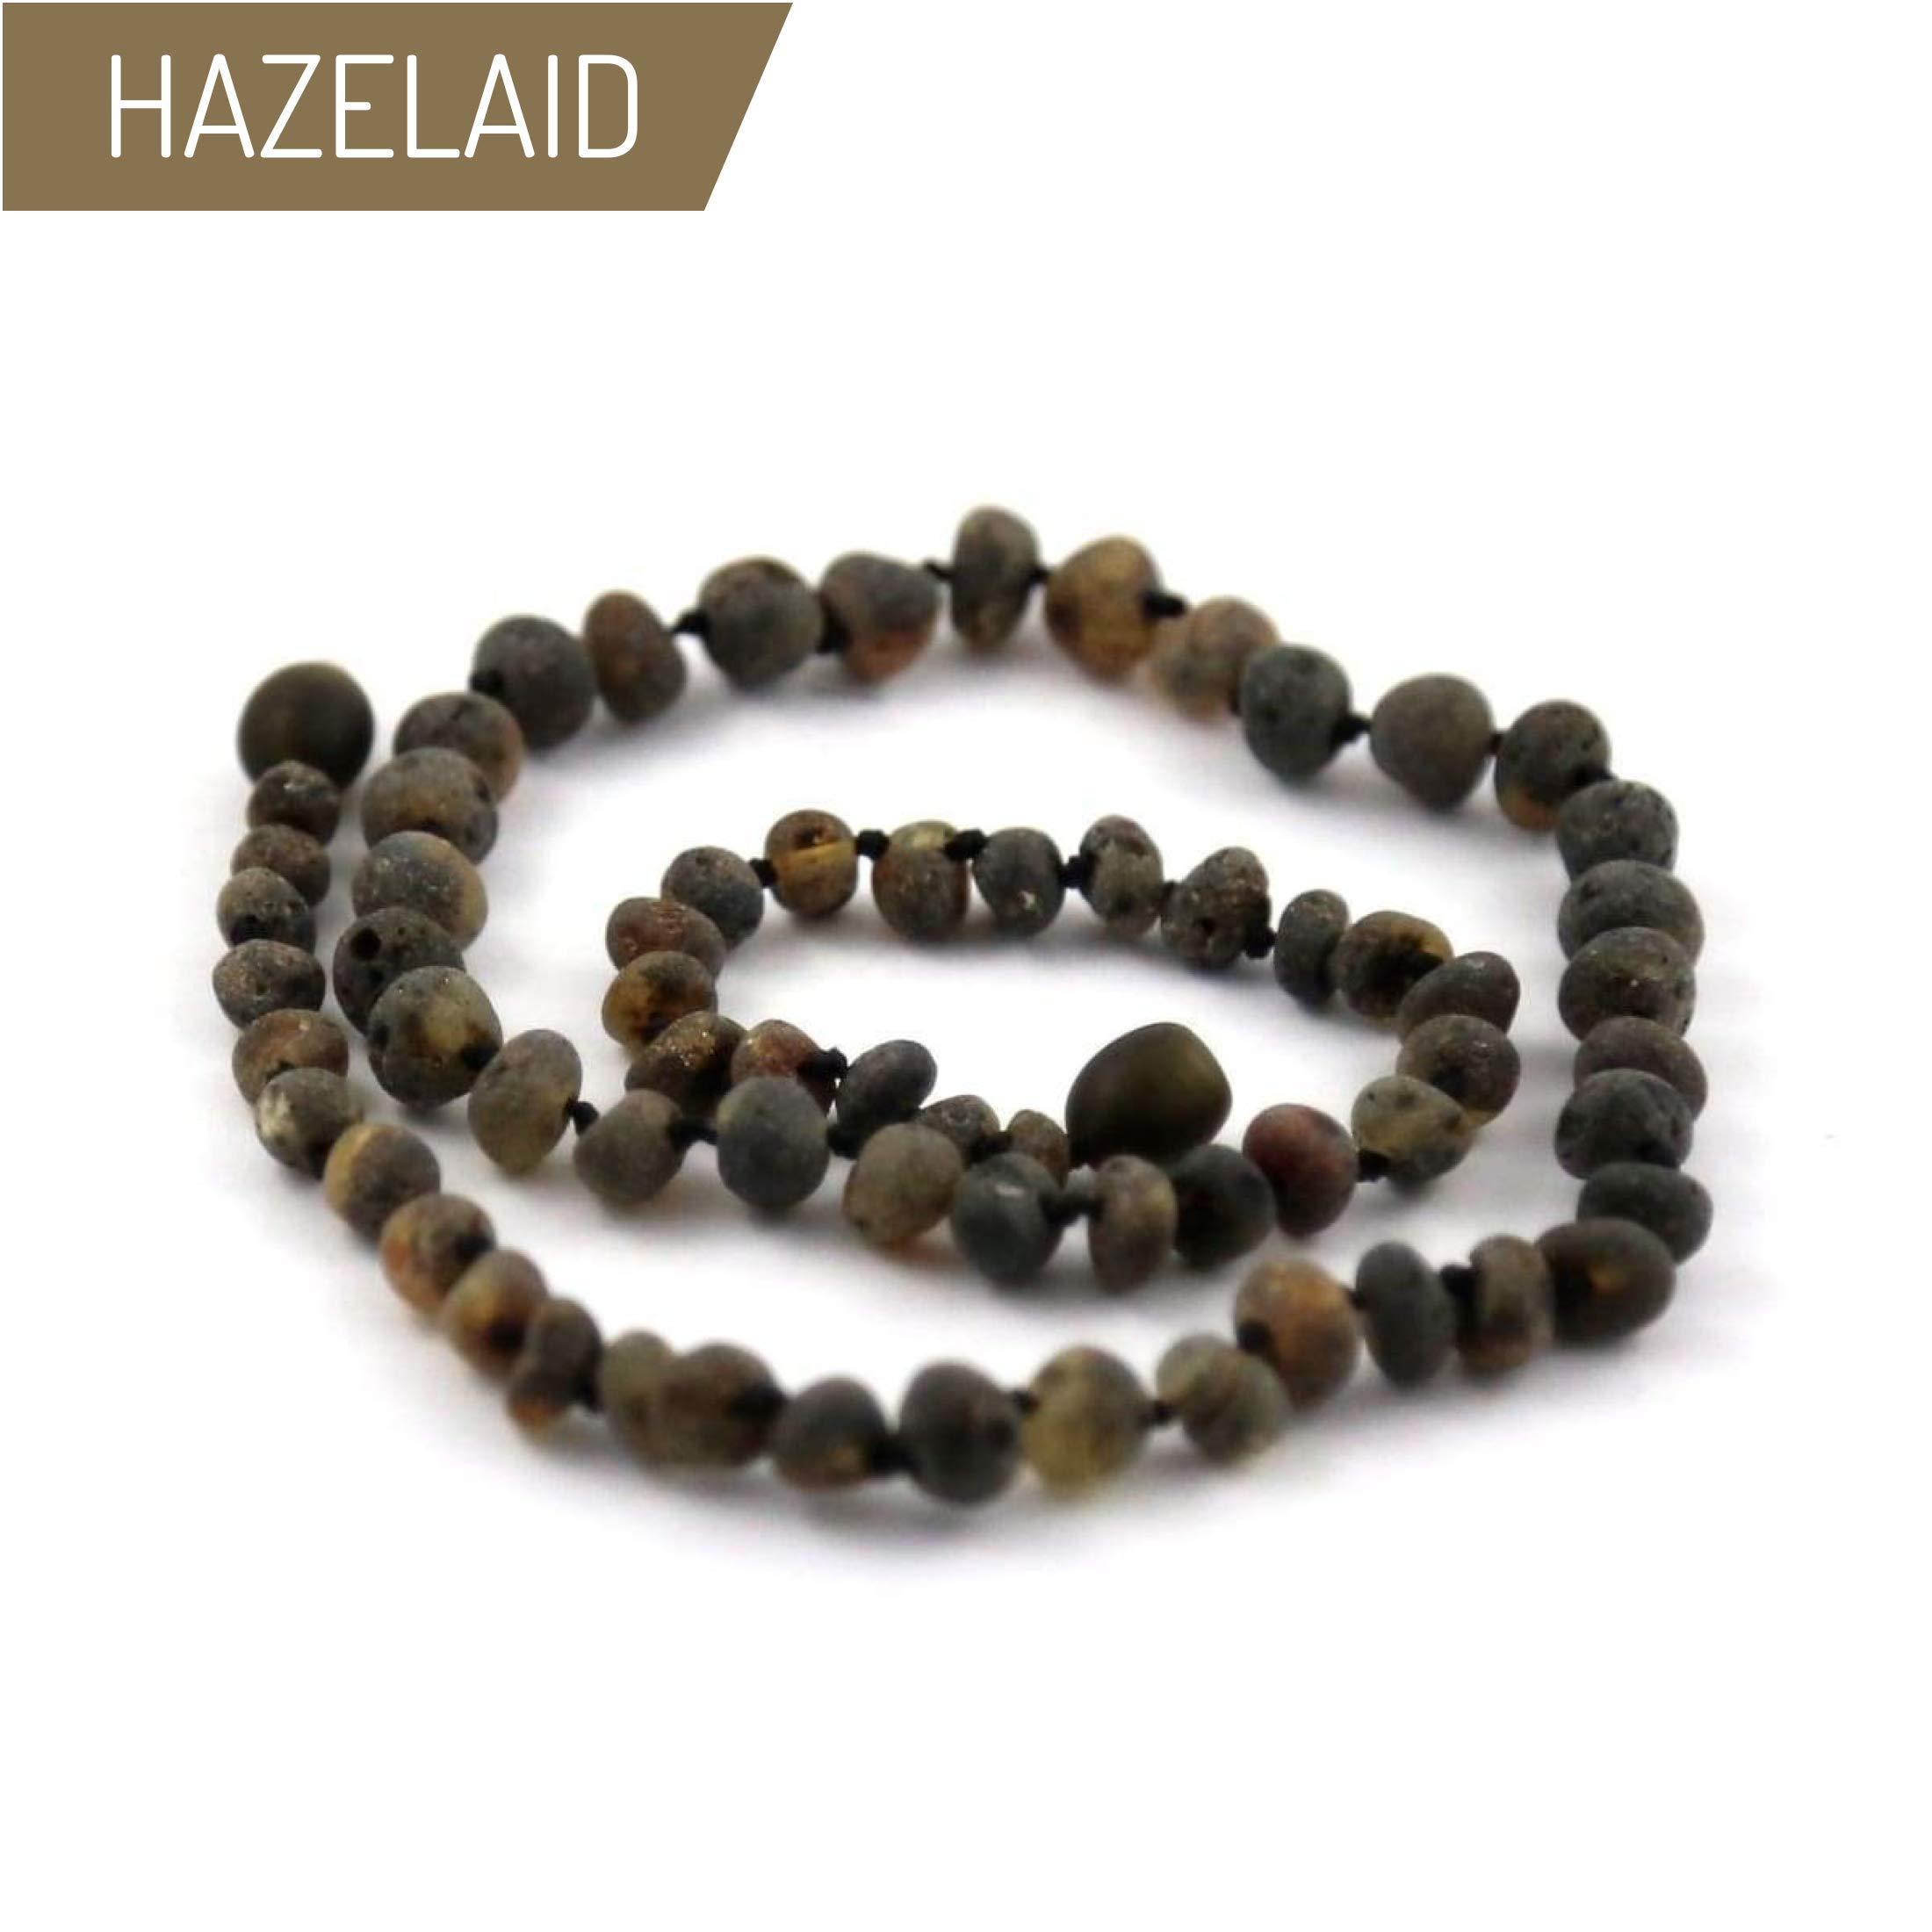 Hazelaid (TM) 12'' Twist-Clasp Baltic Amber Asteroid Necklace by HAZELAID